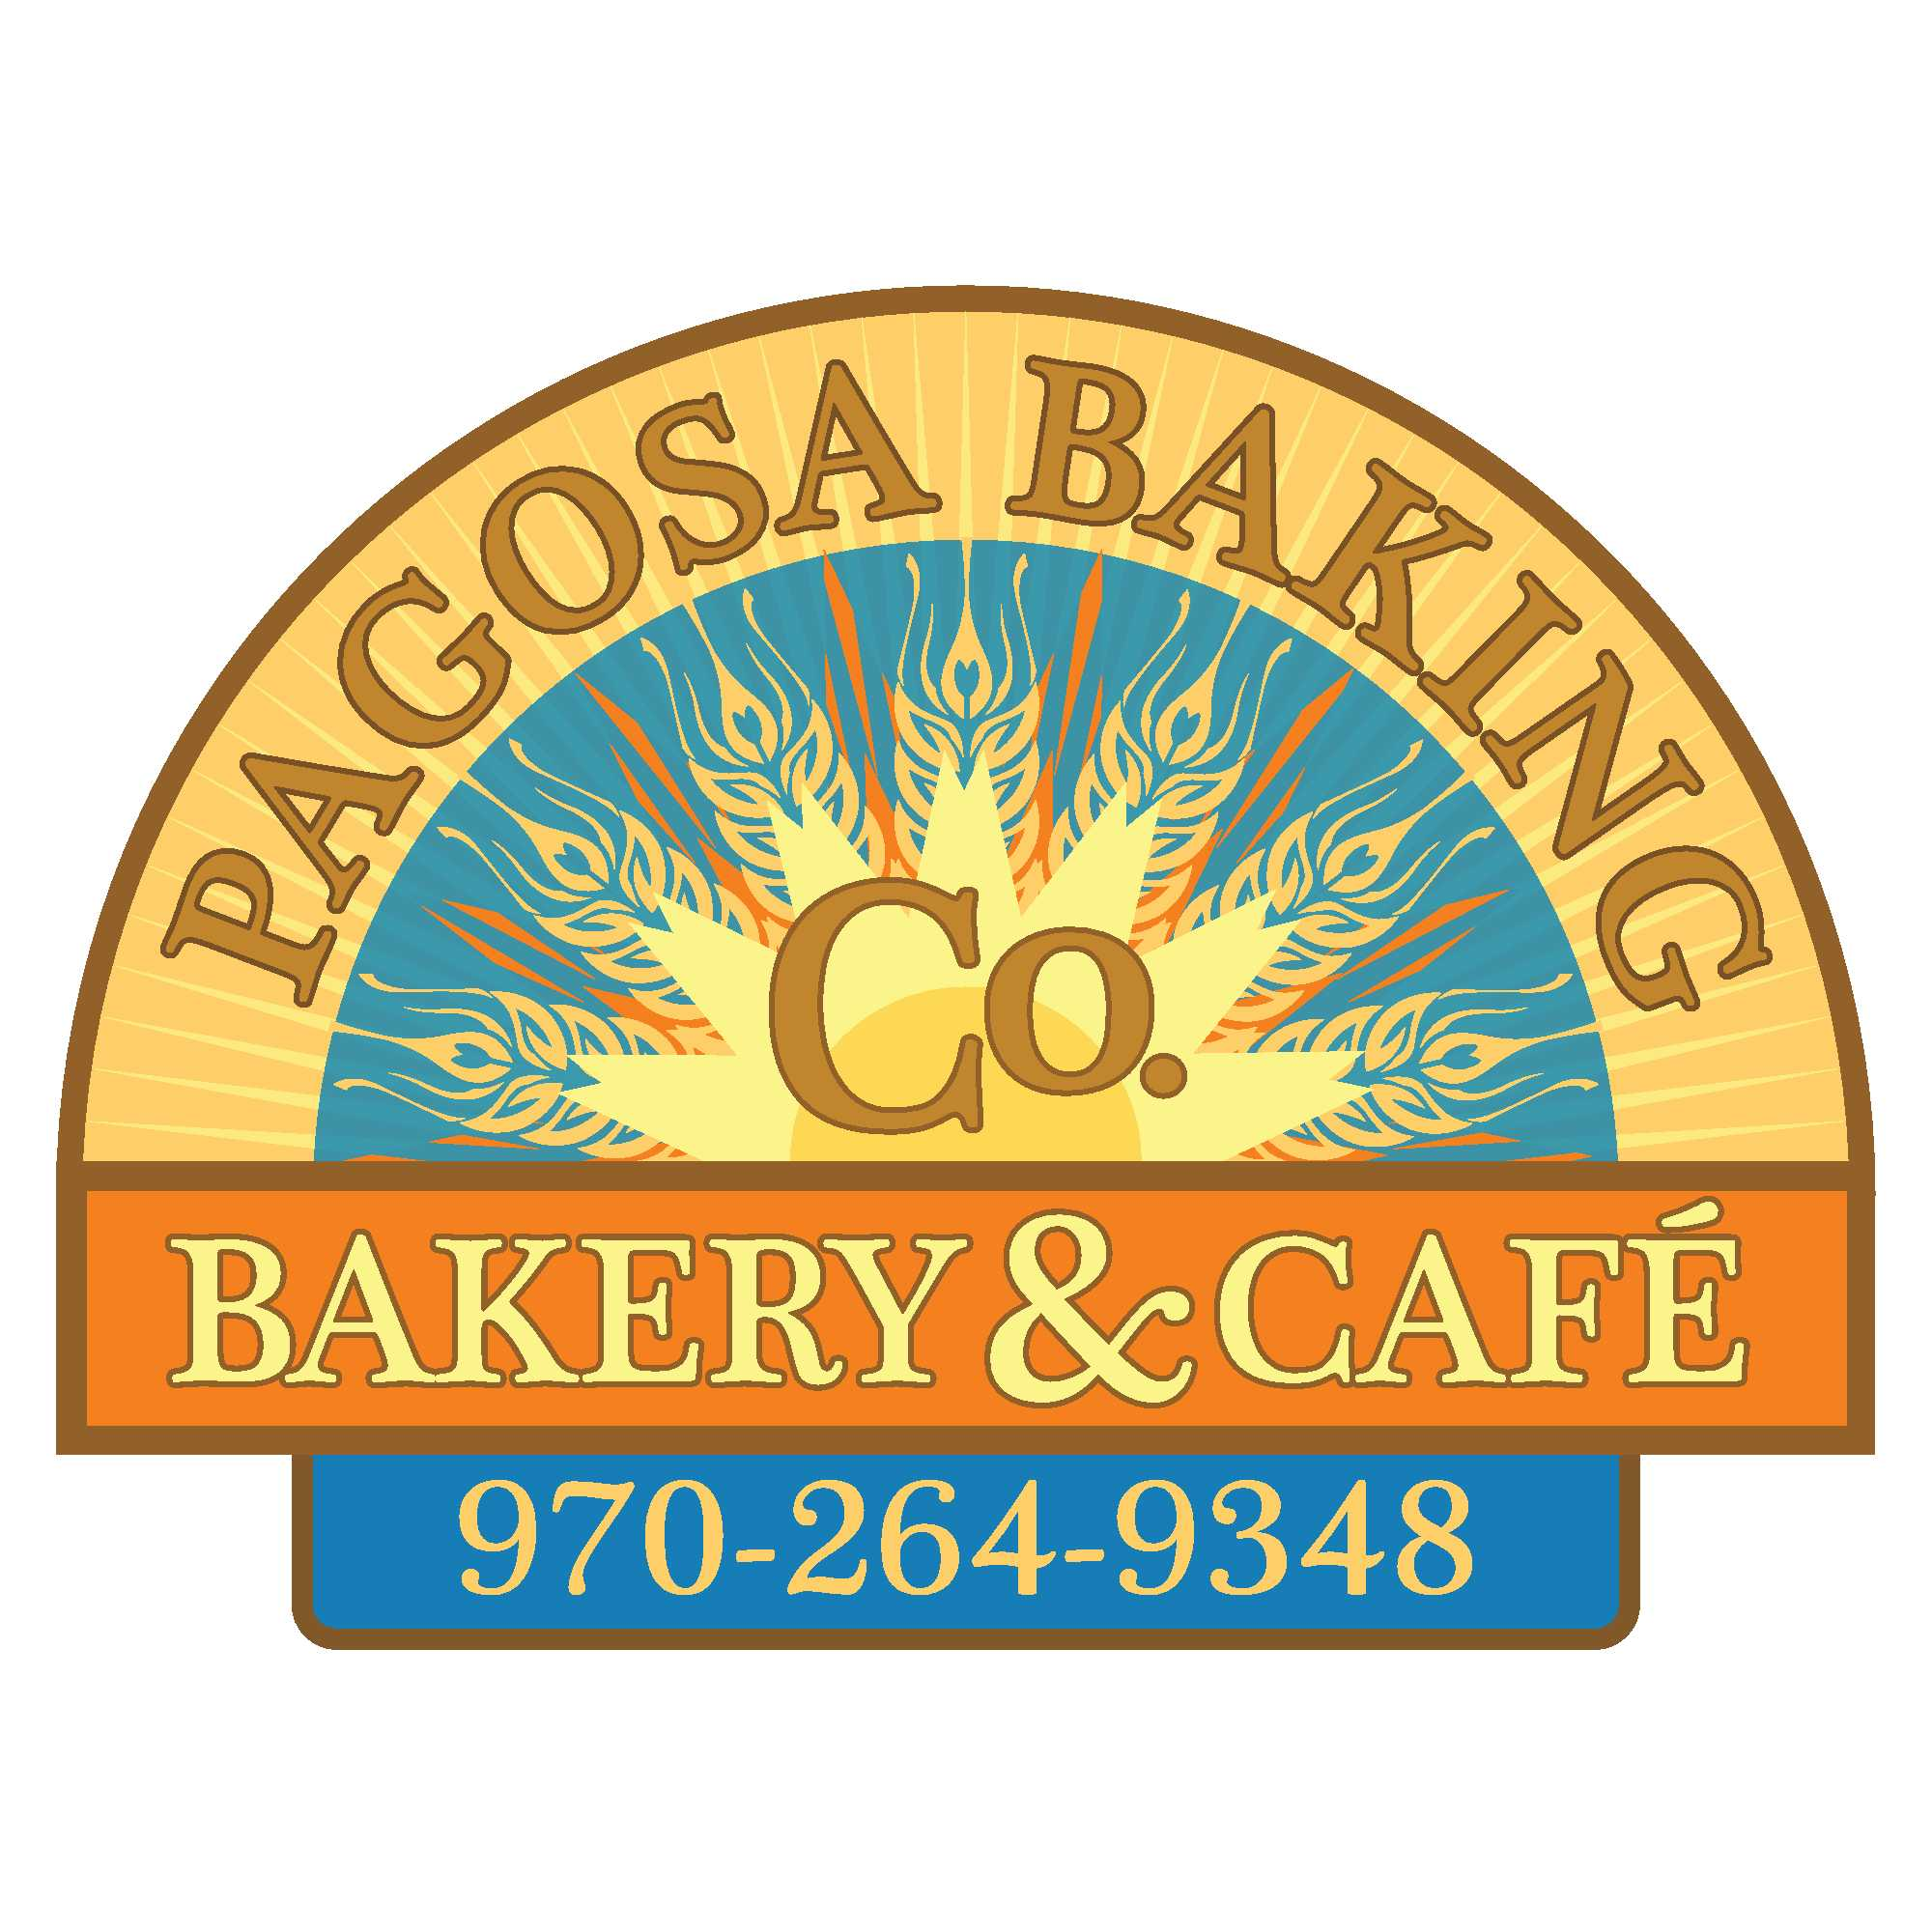 Pagosa Baking Company